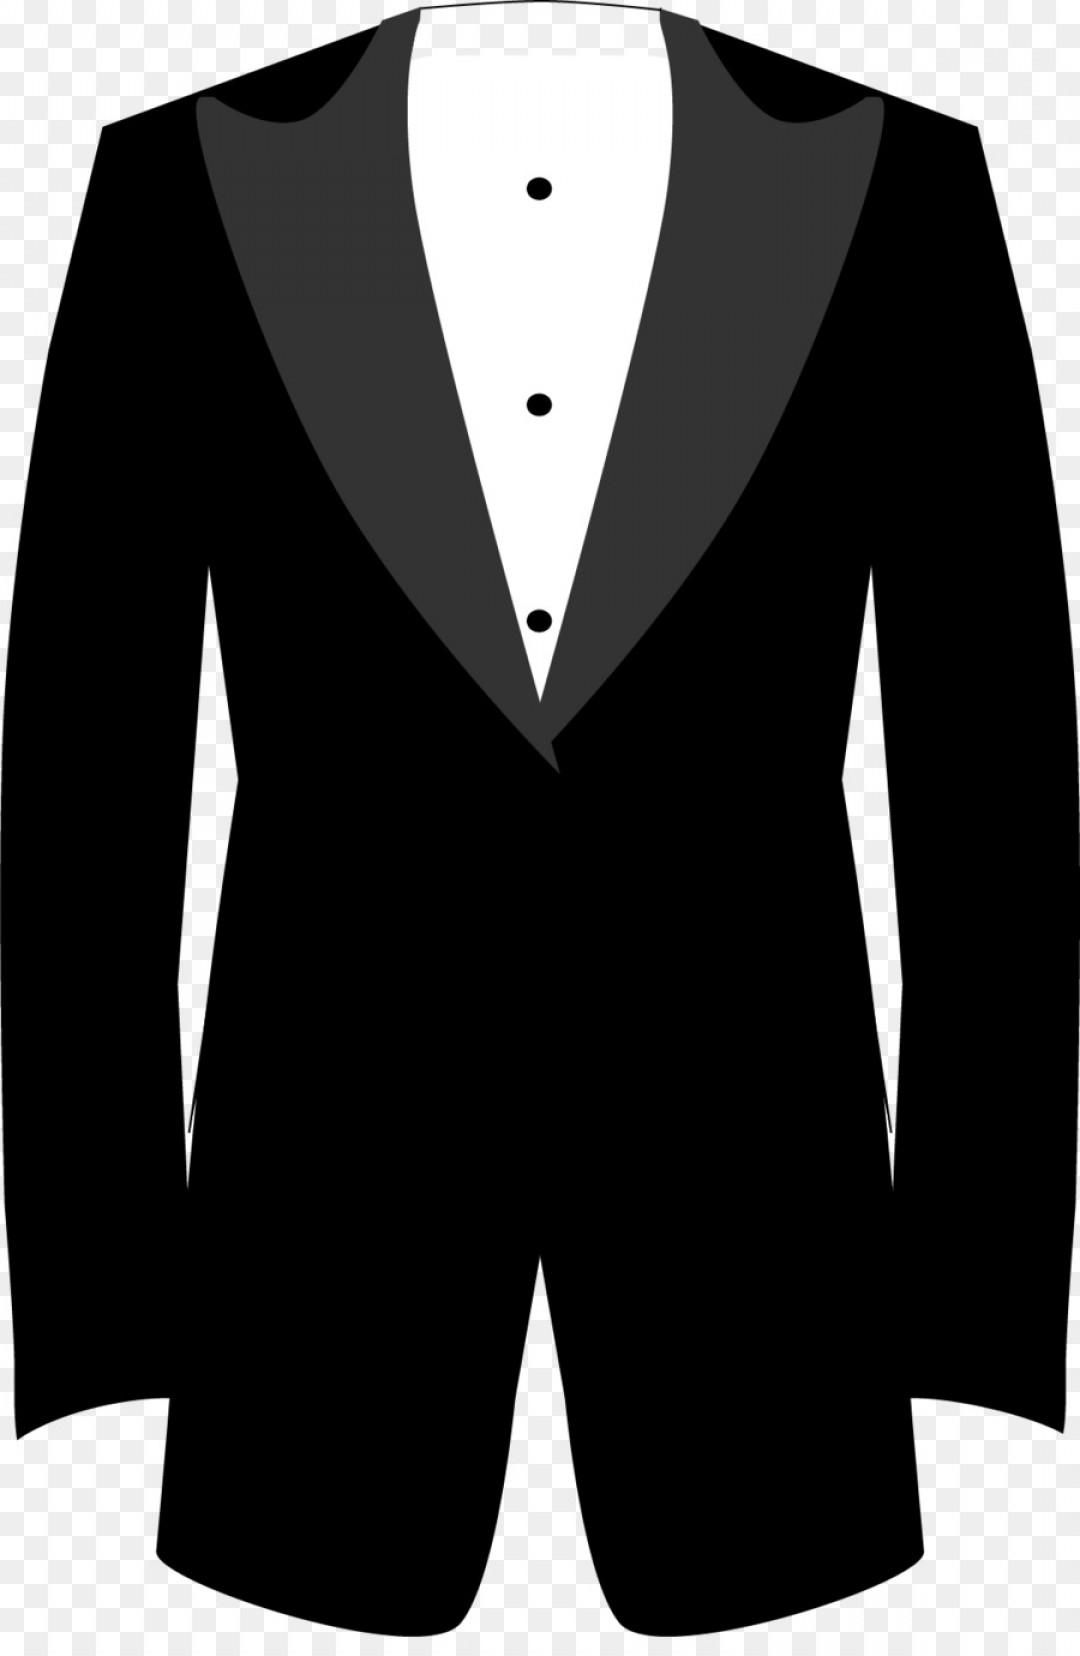 Coat tie clipart graphic freeuse download Png T Shirt Tuxedo Bow Tie Clip Art Vector Suit | SOIDERGI graphic freeuse download